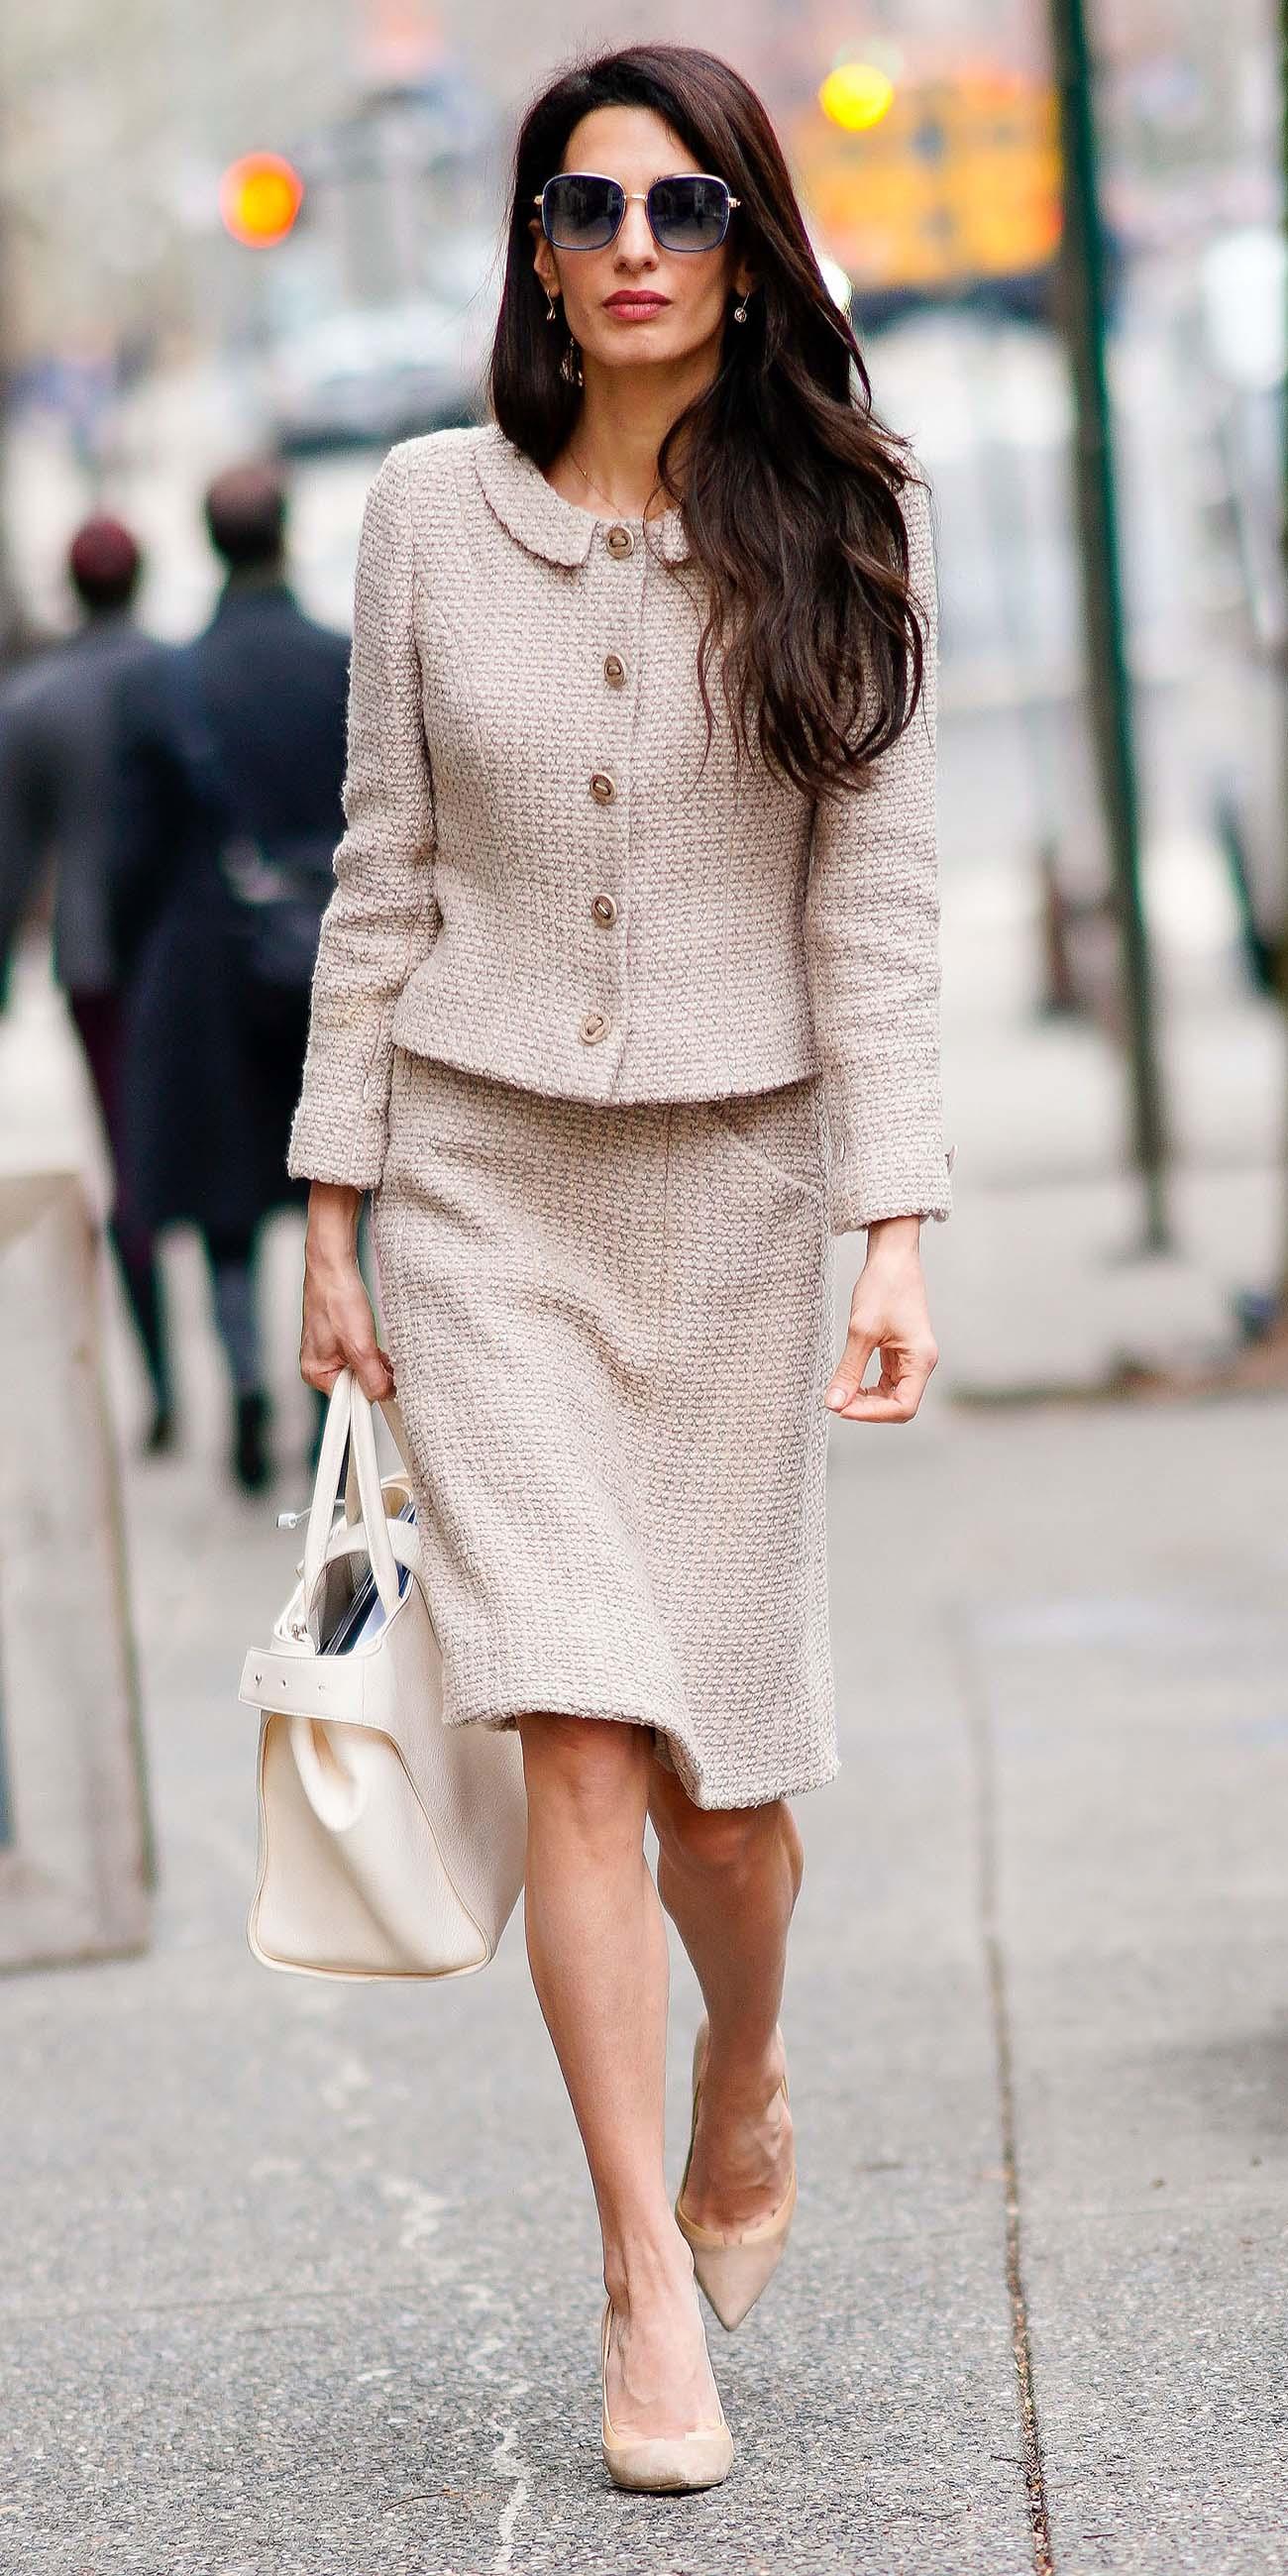 amalclooney-tan-pencil-skirt-skirtsuit-brun-sun-white-bag-tan-shoe-pumps-tan-jacket-lady-fall-winter-work.jpg